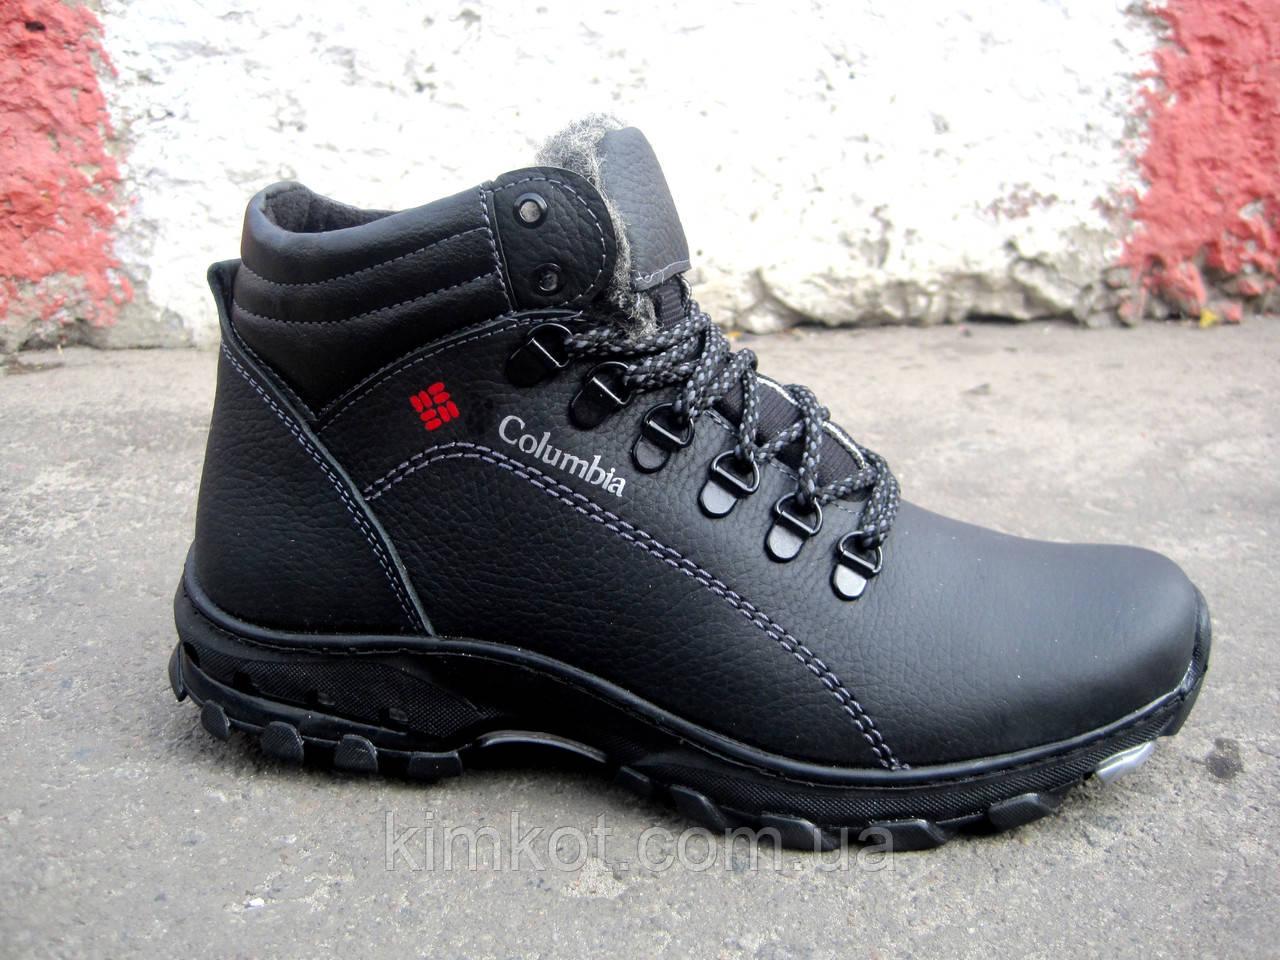 8a46996a8ae4 Зимние кожаные мужские ботинки Columbia  продажа, цена в Харькове ...